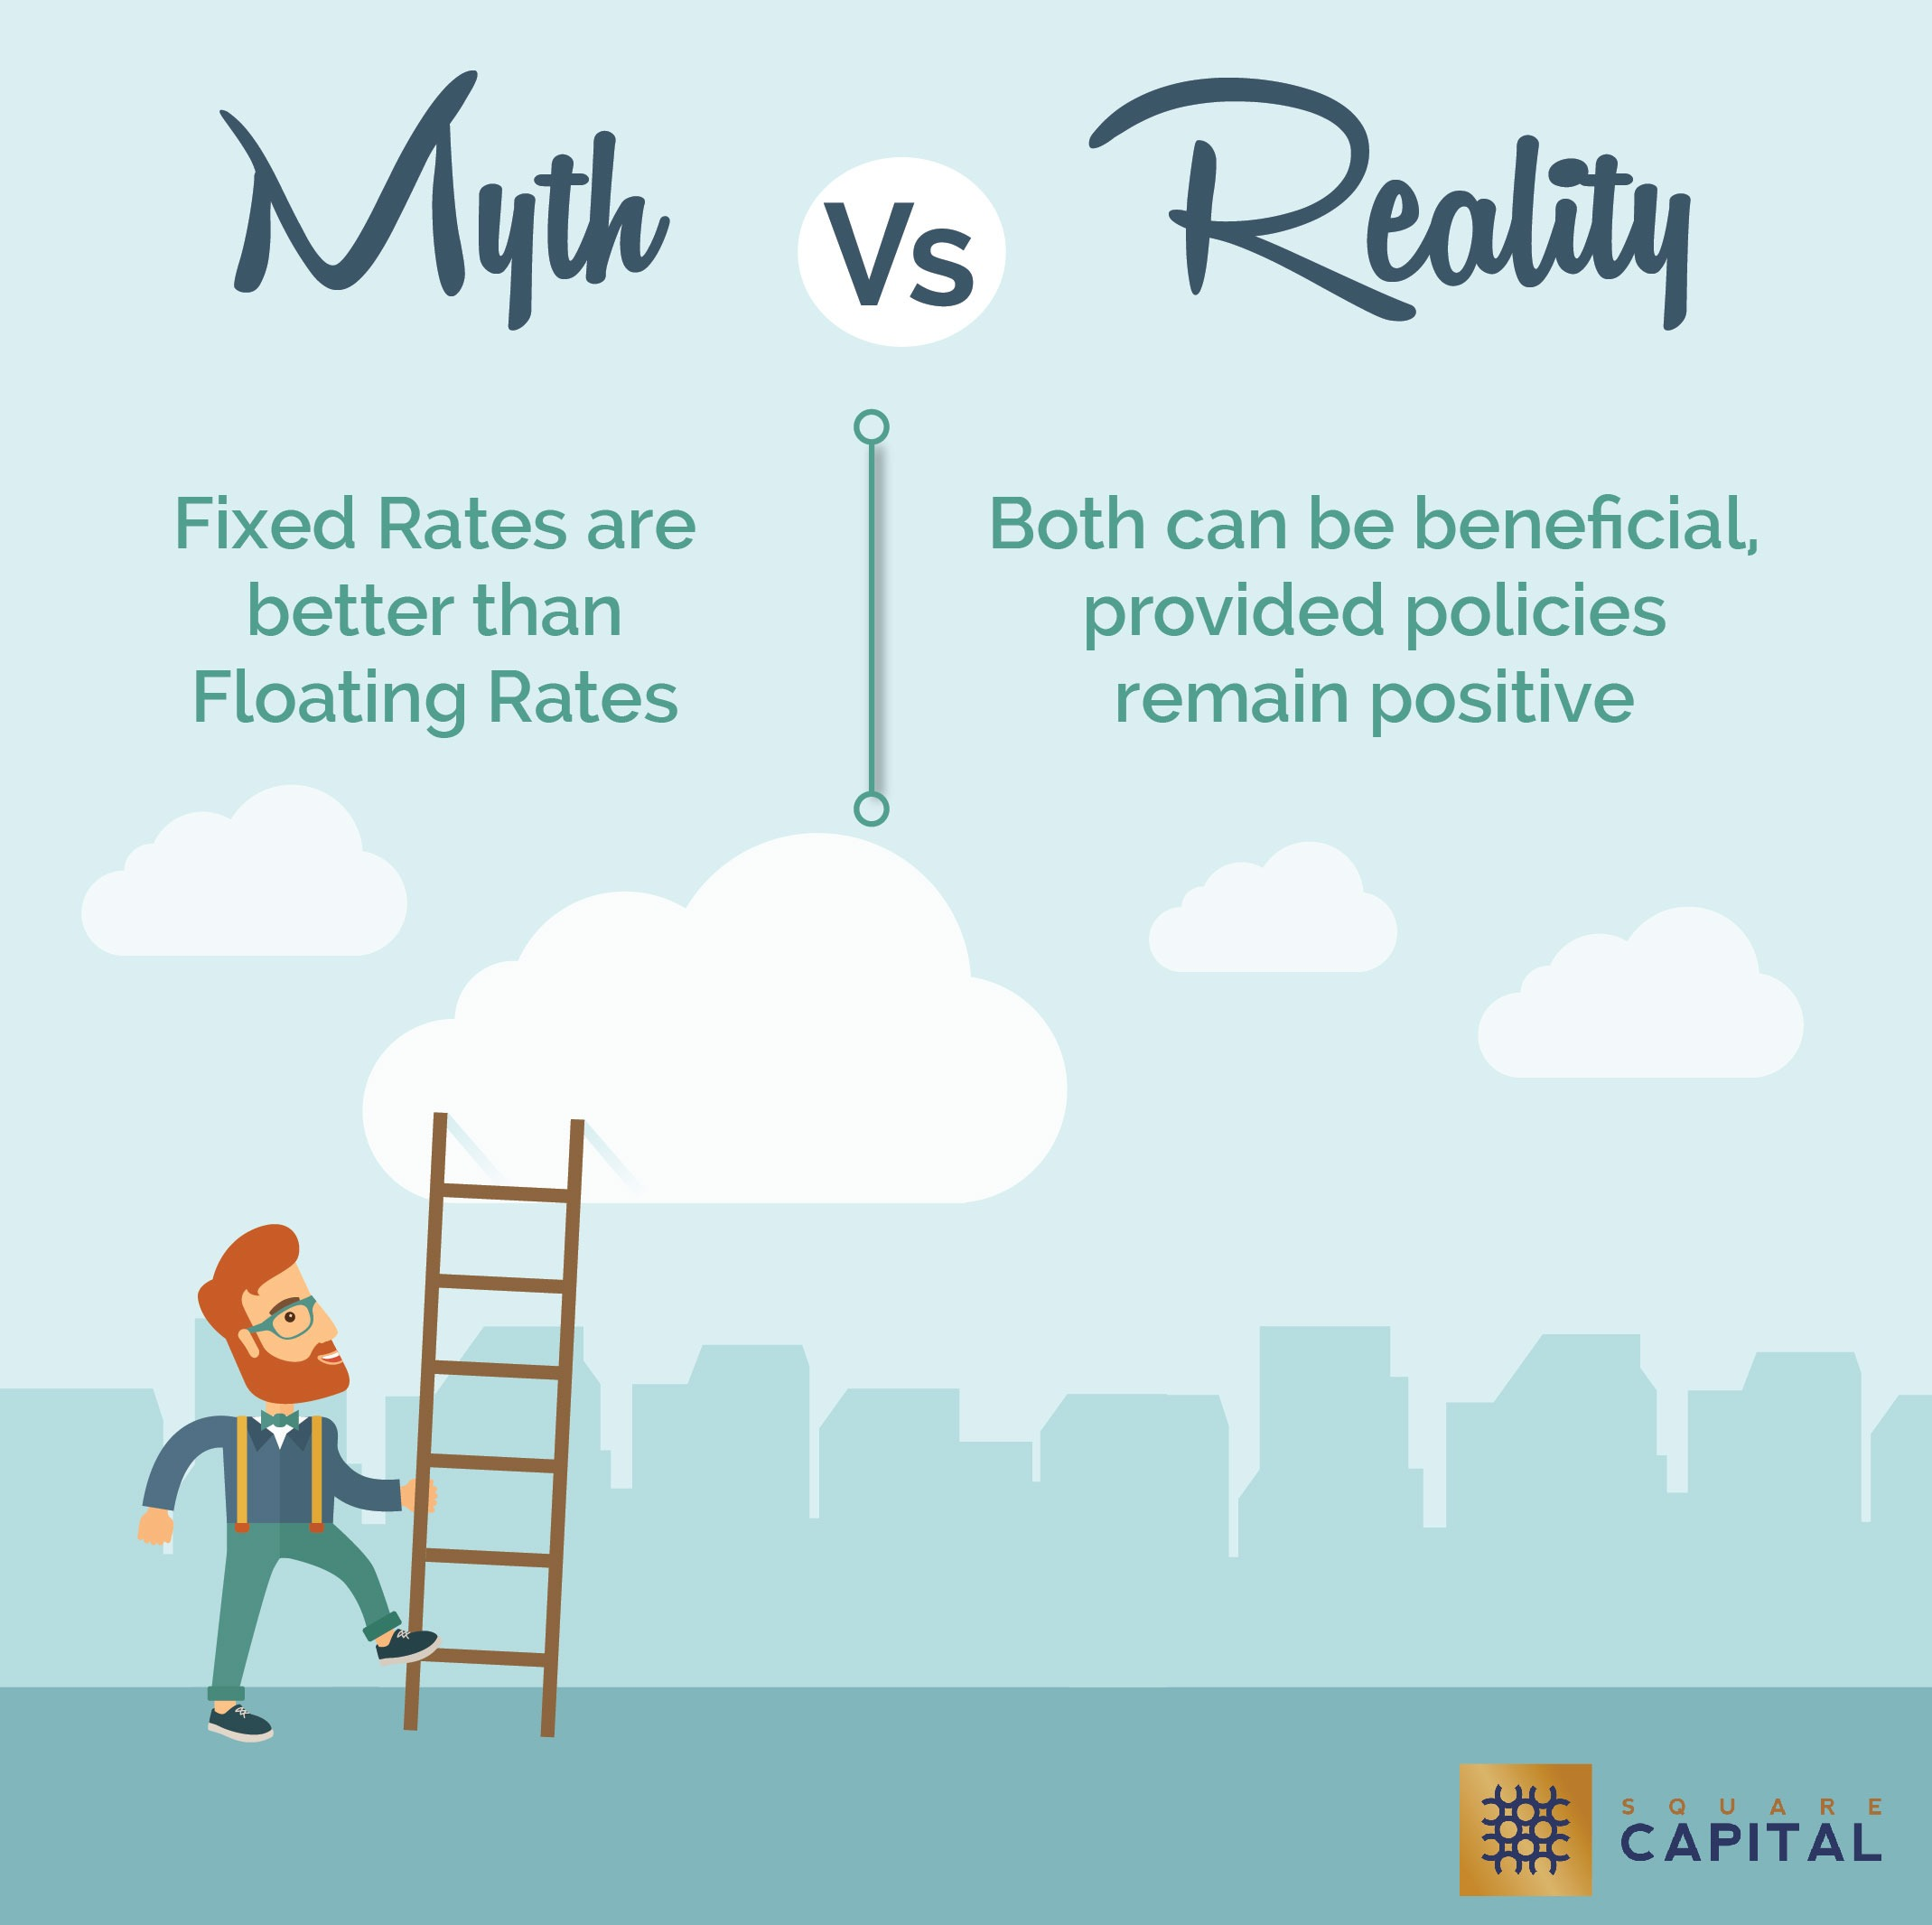 myth vs Realty-08